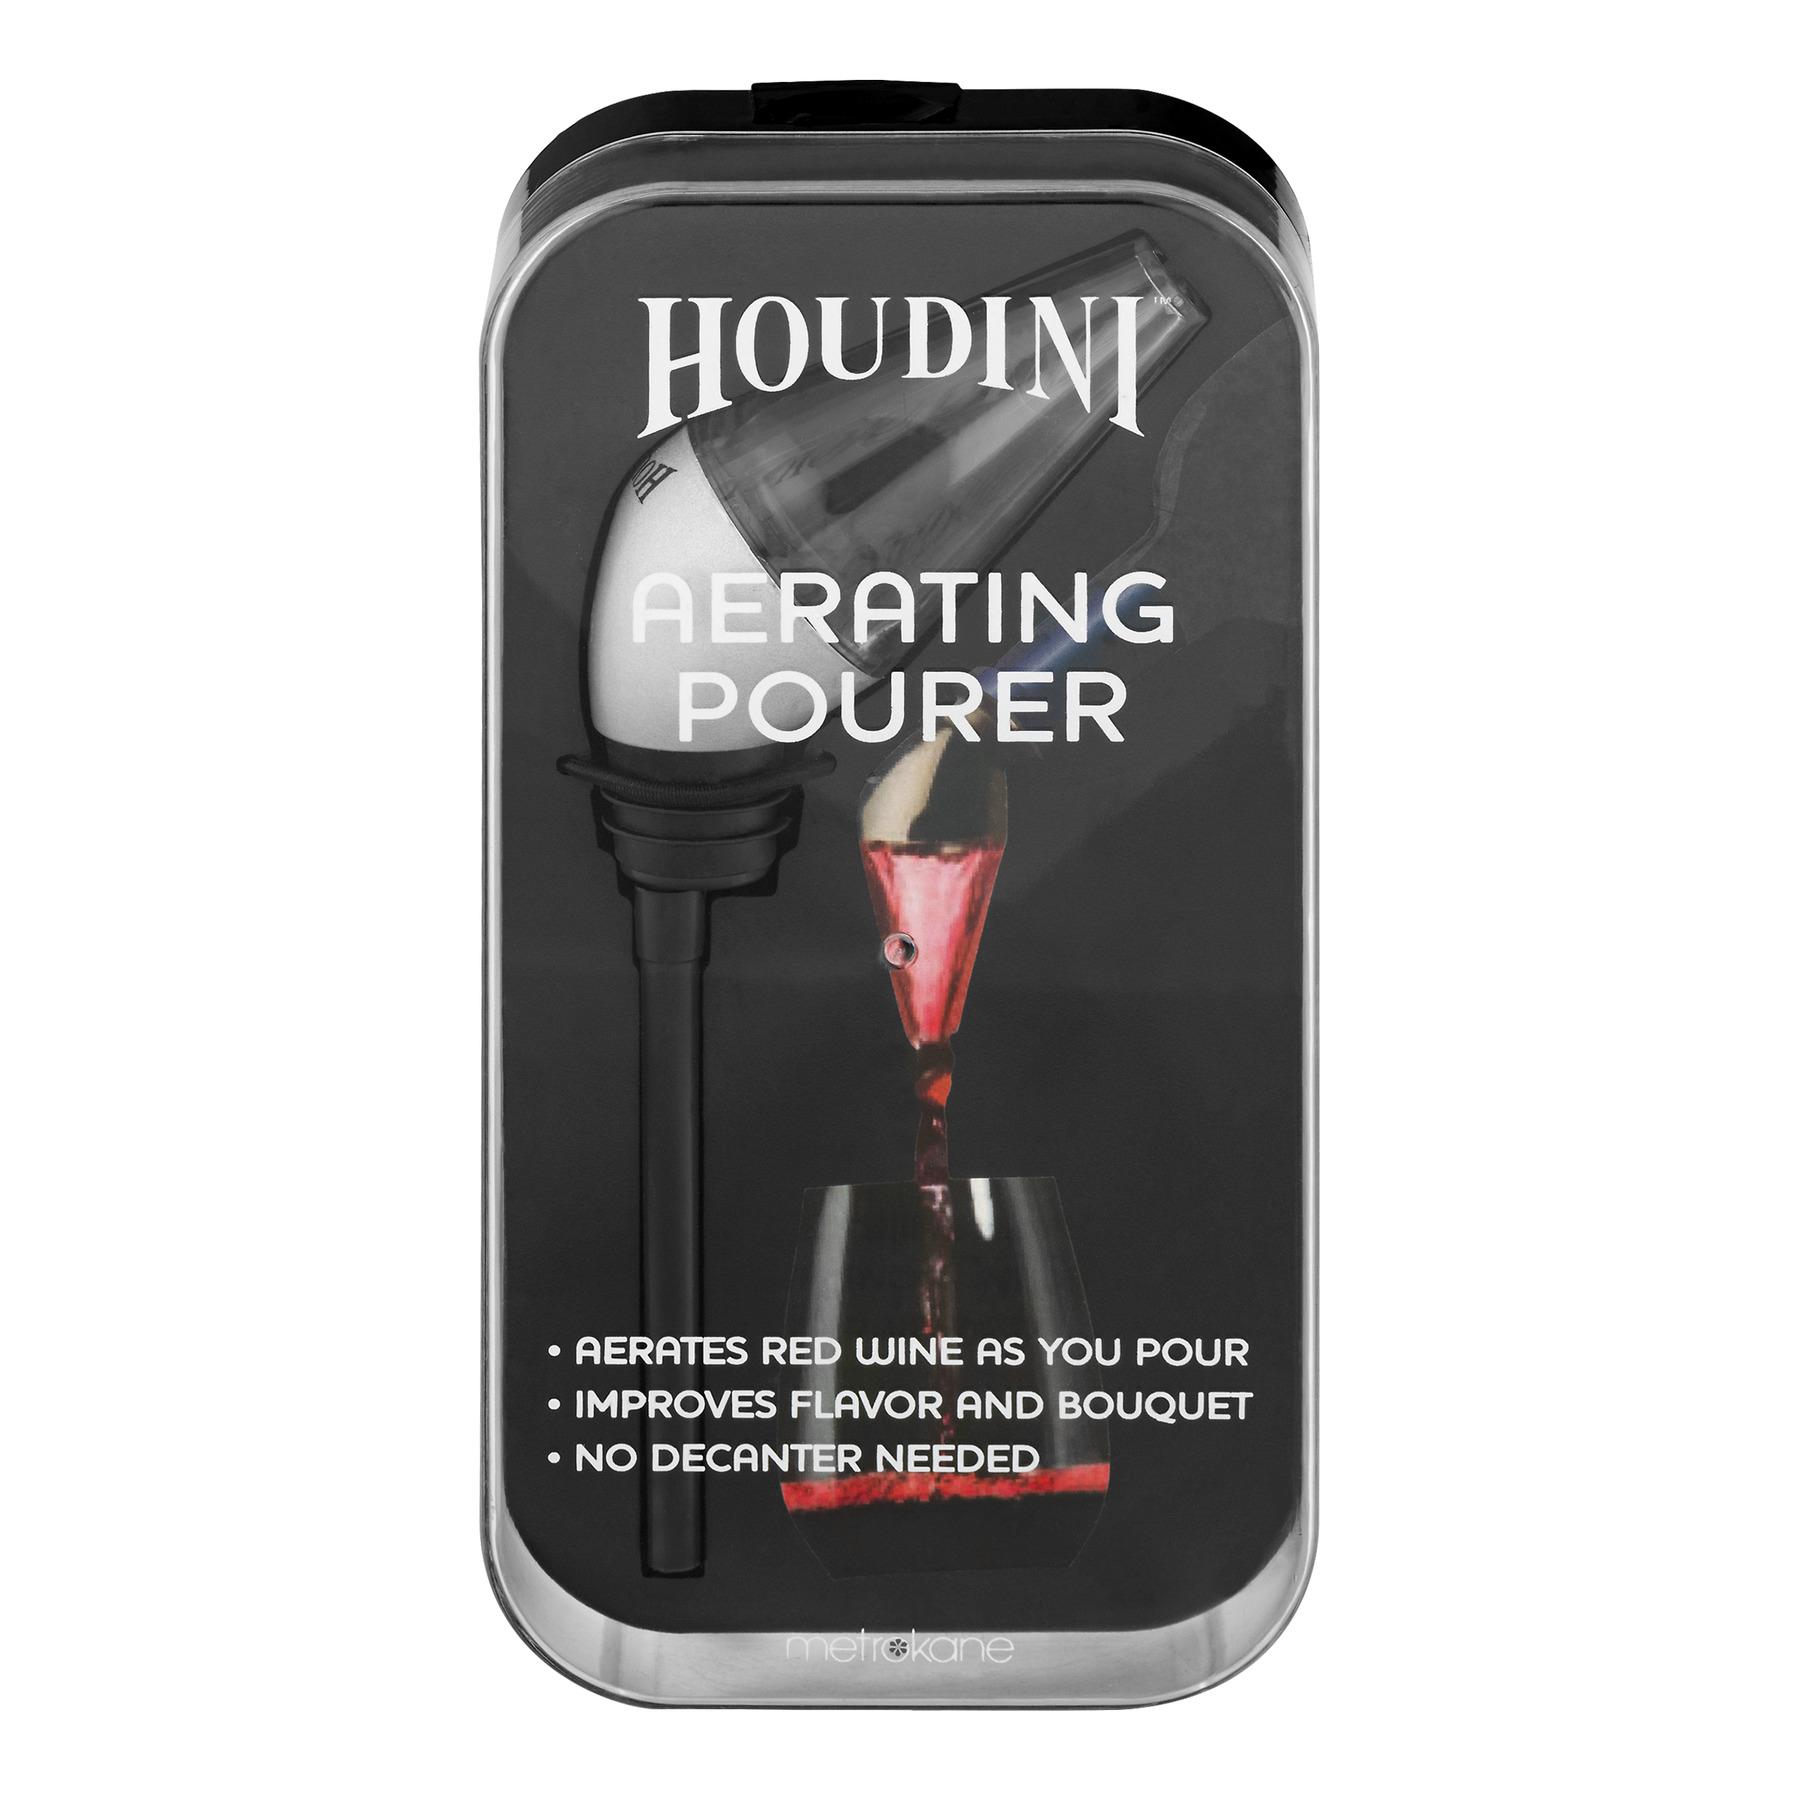 Houdini Aerating Pourer, 1.0 CT